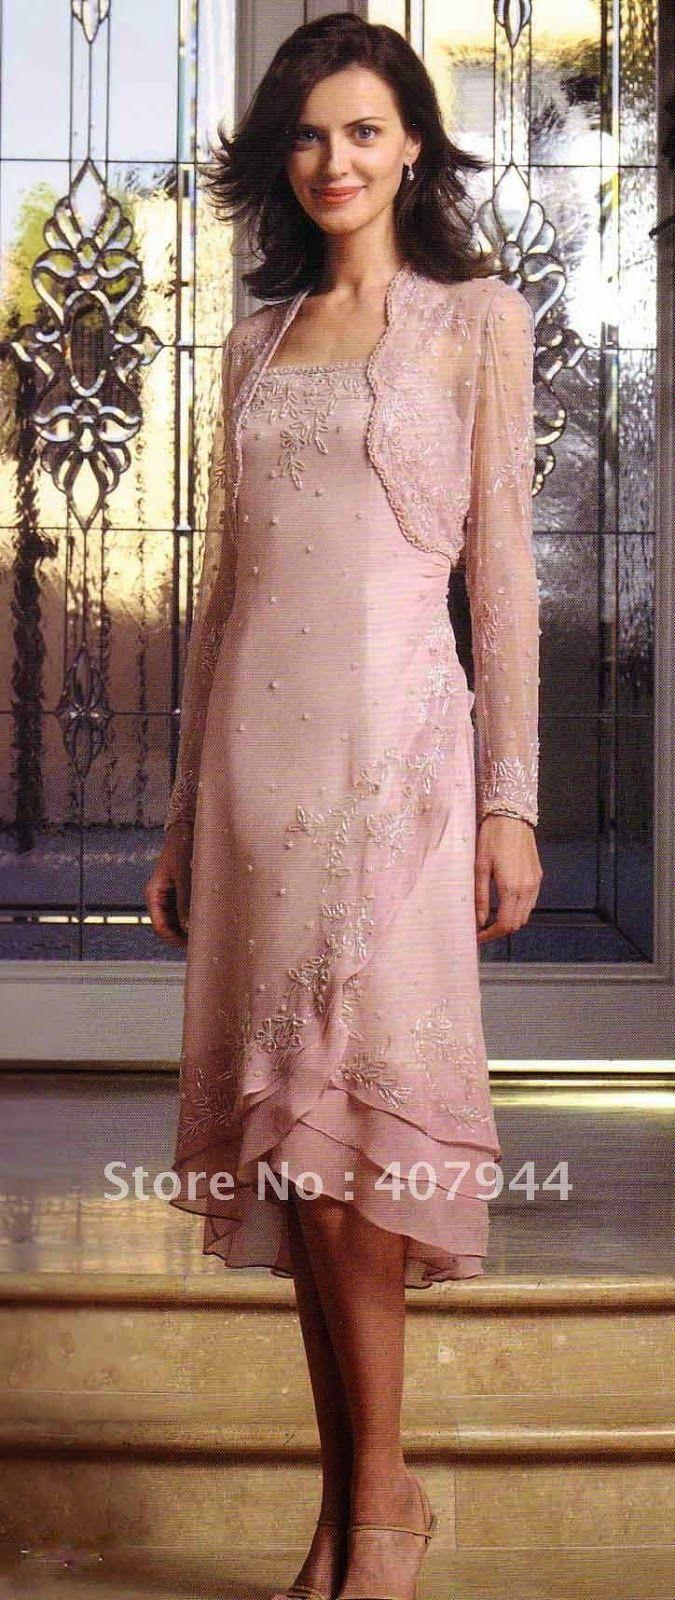 89 best Mother images on Pinterest   Cute dresses, Elegant dresses ...